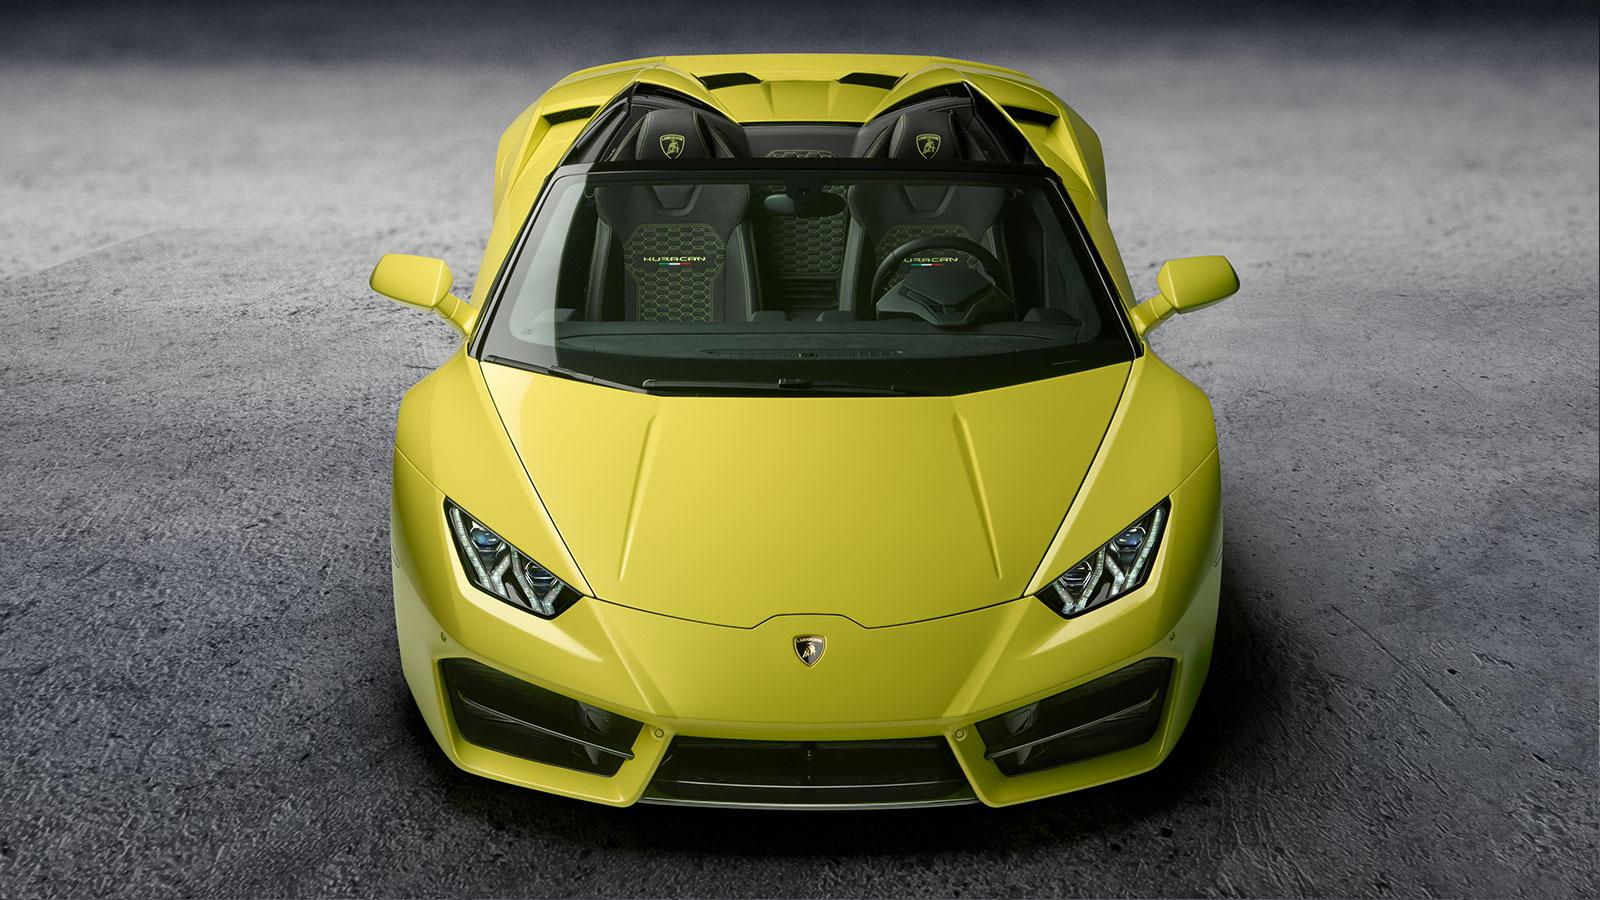 Lamborghini Huracan RWD Spyder - Breathtaking Technology image 10